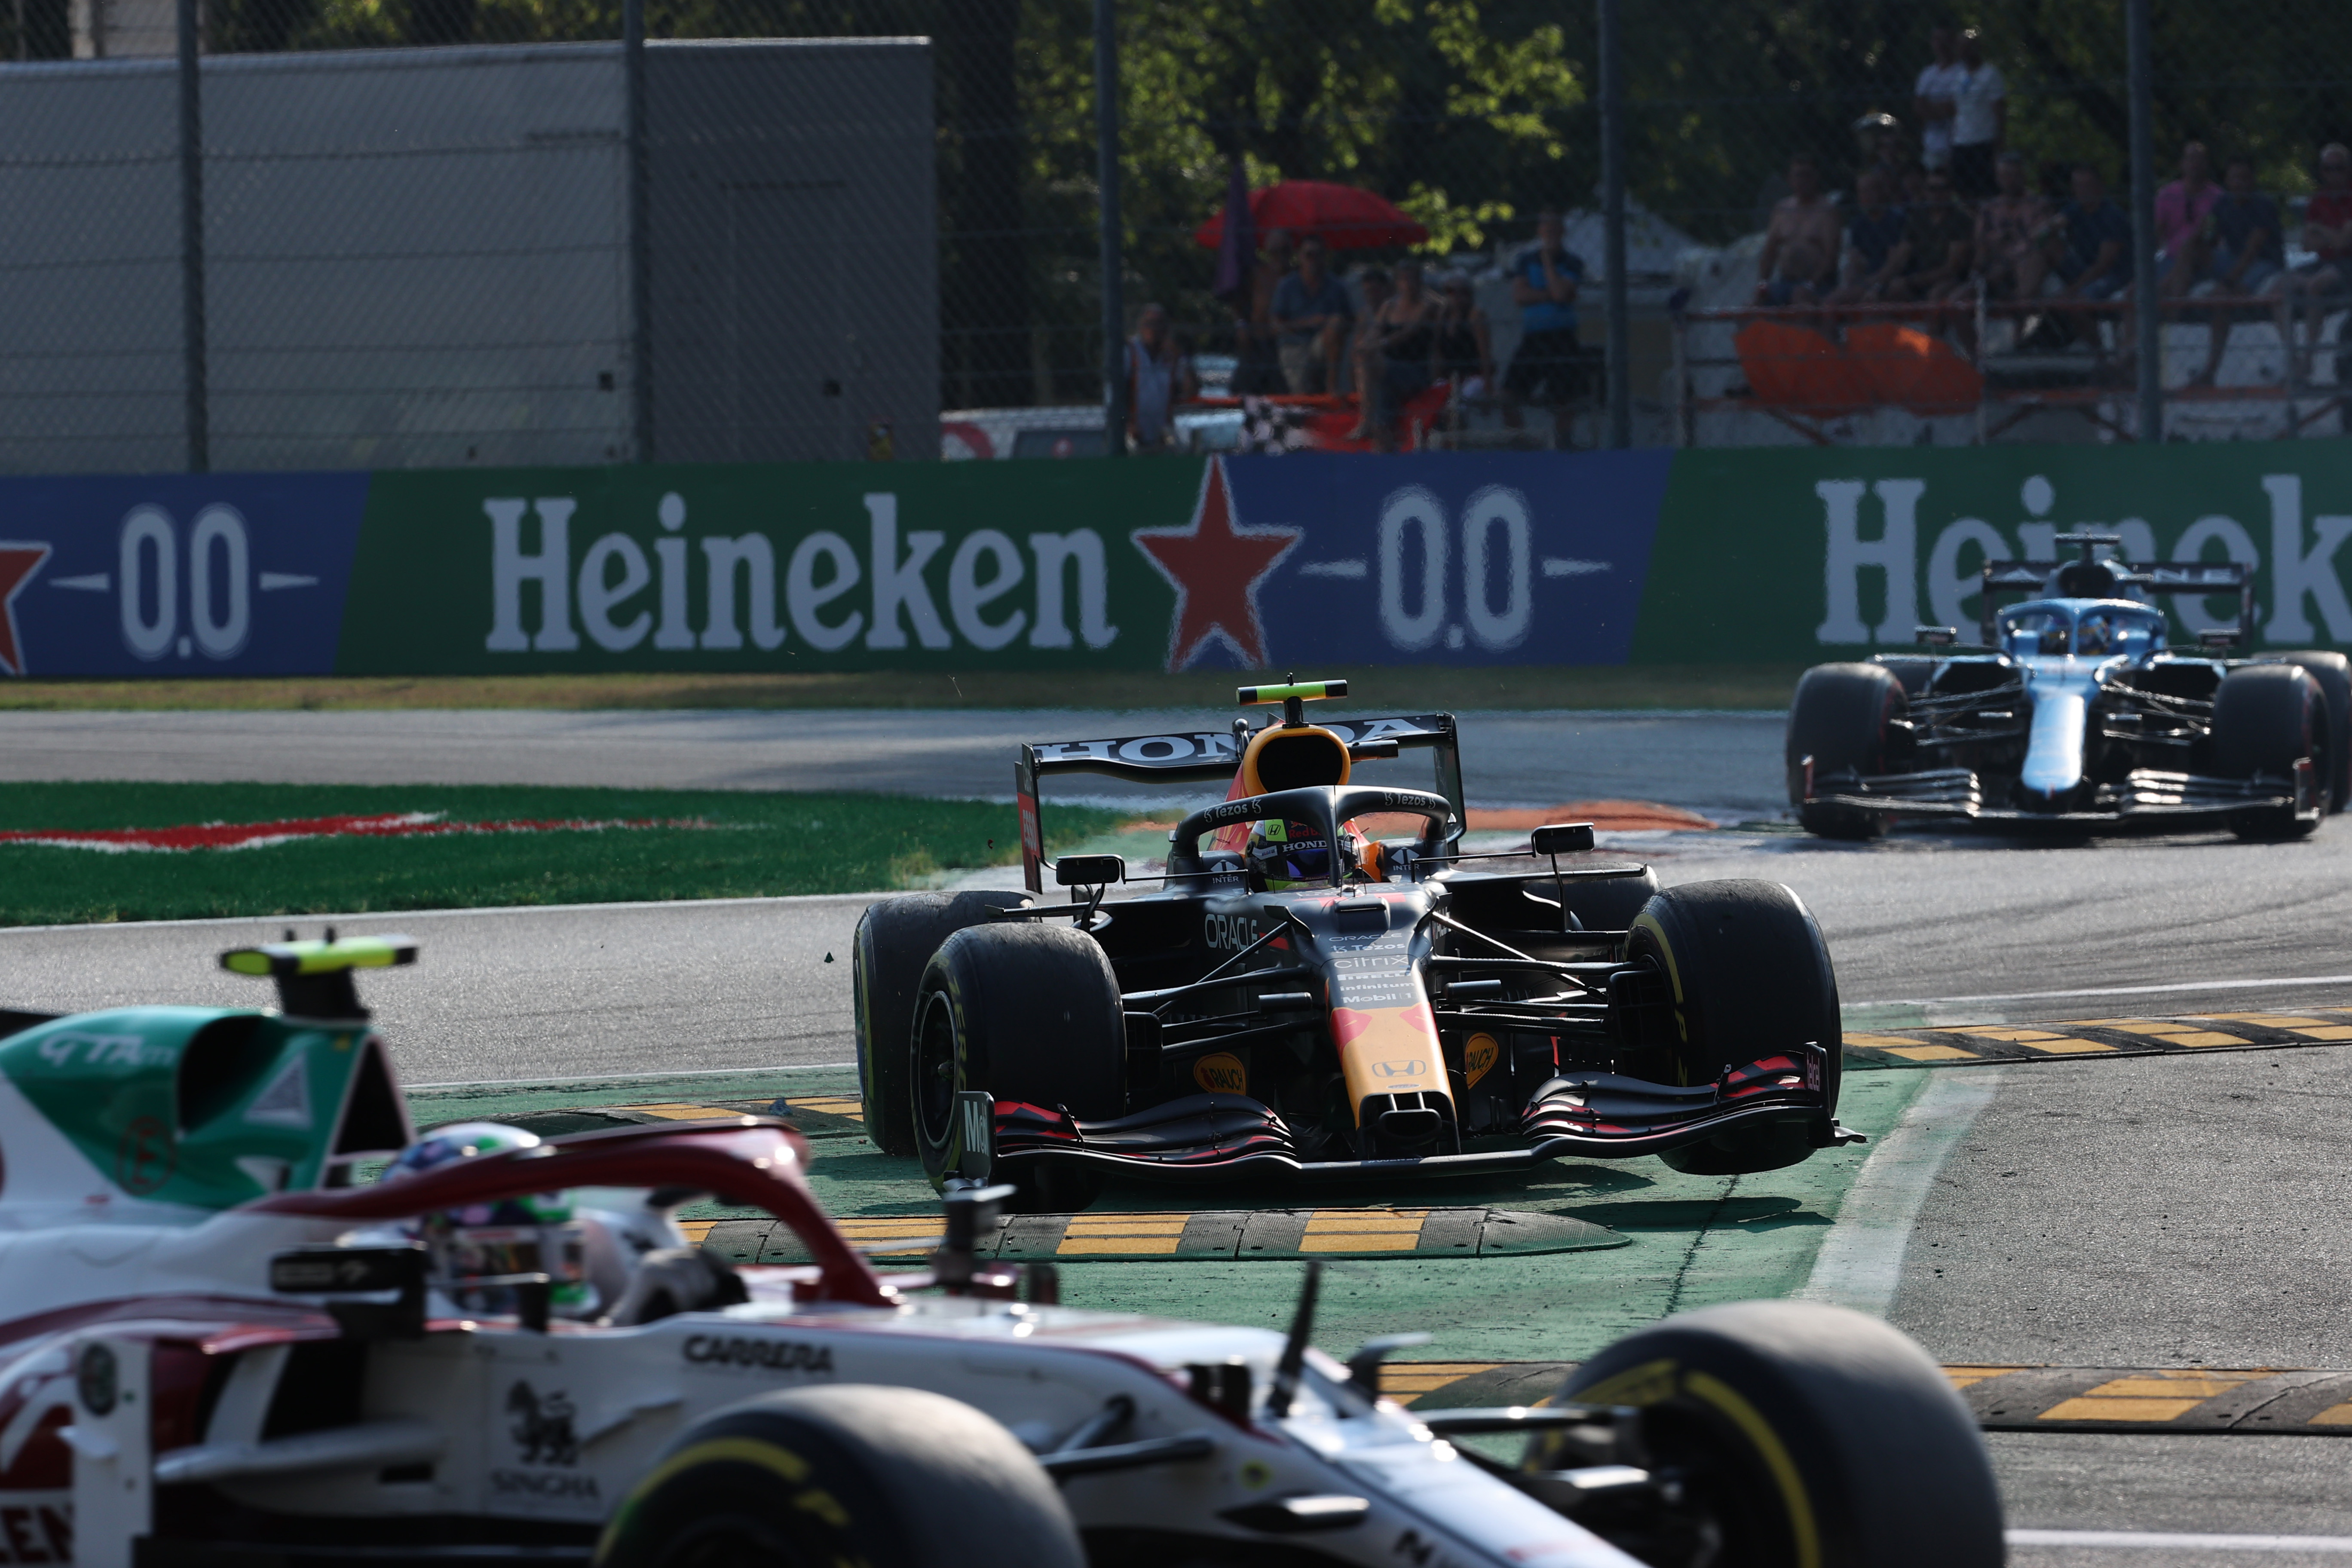 Motor Racing Formula One World Championship Italian Grand Prix Sprint Day Monza, Italy